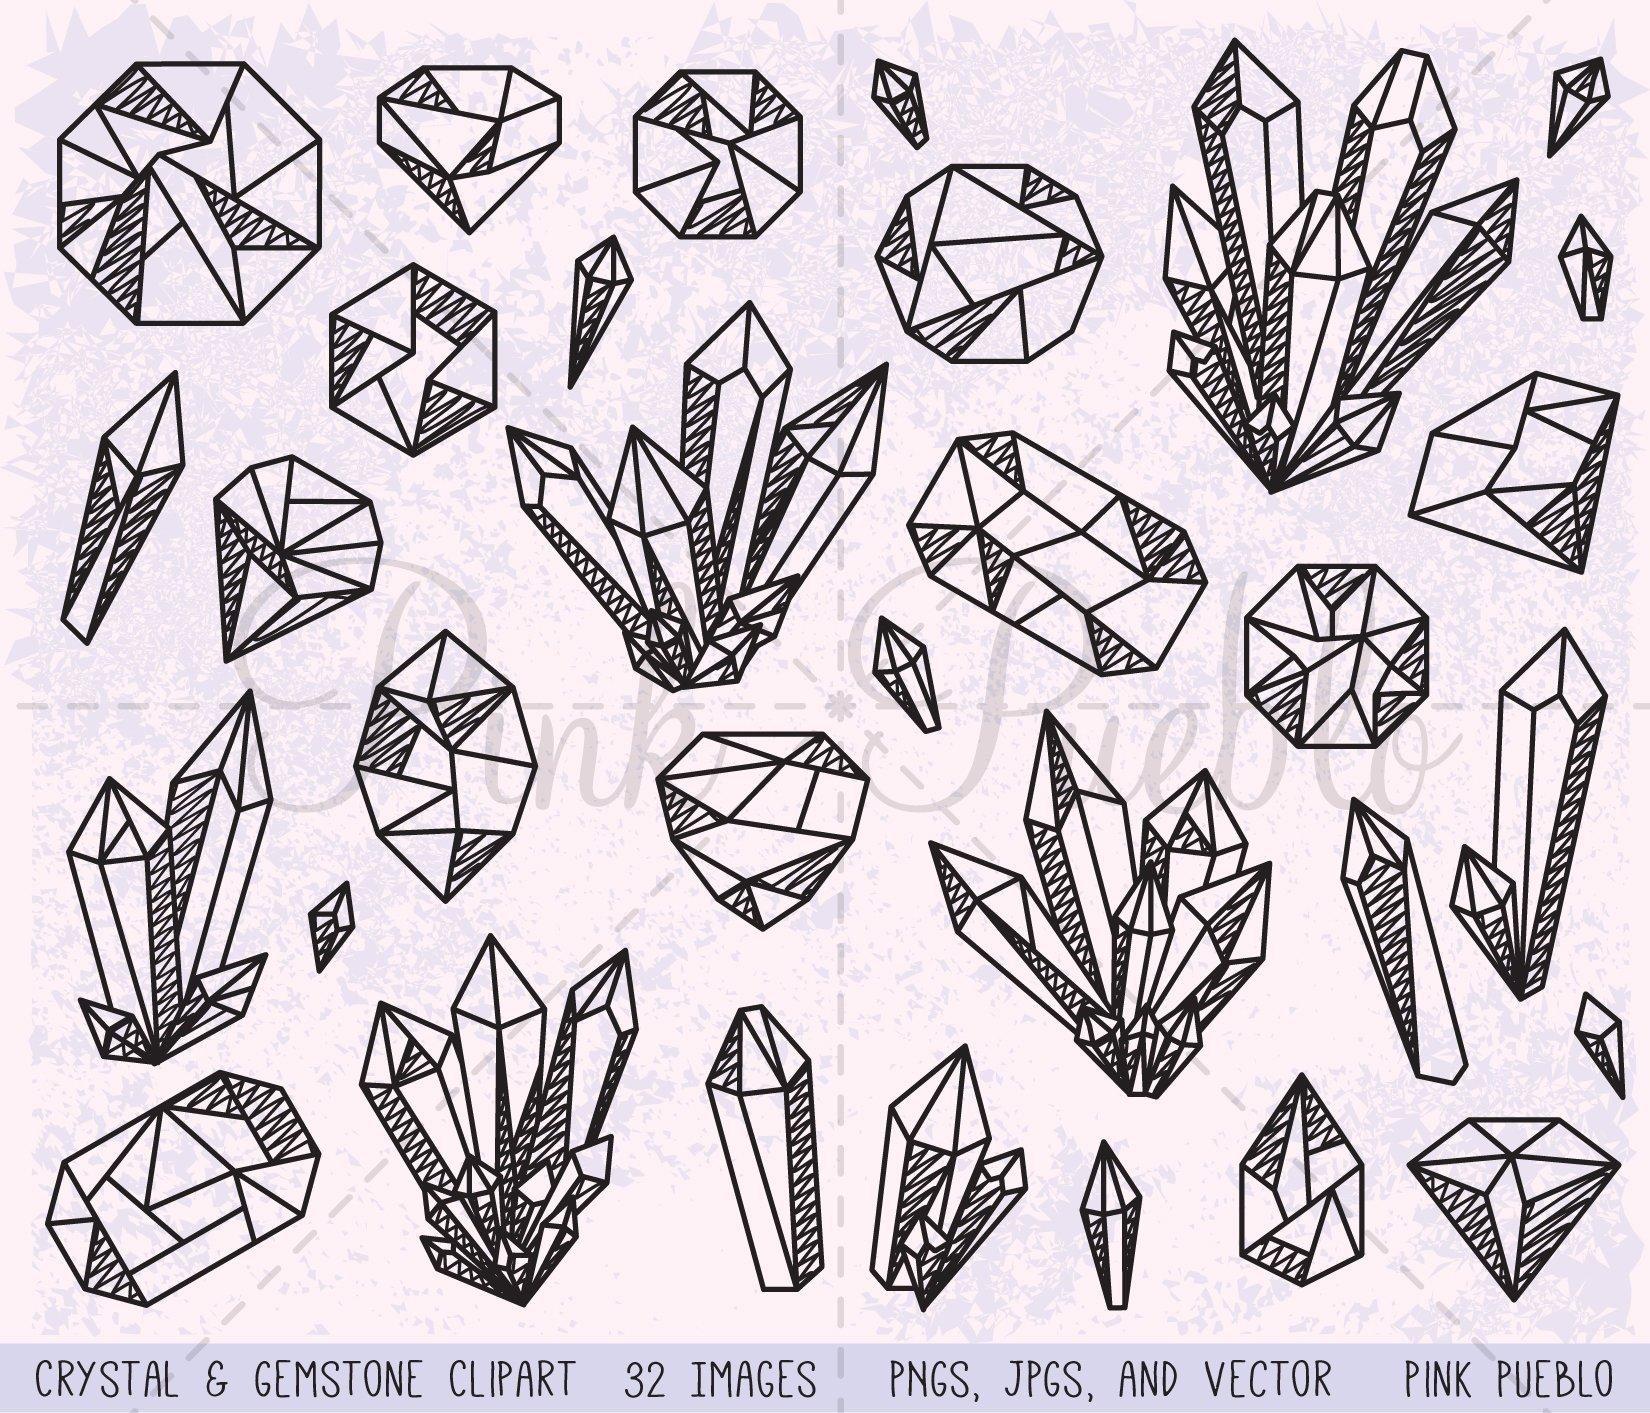 Crystal clipart. And gemstone vectors pinkpueblo